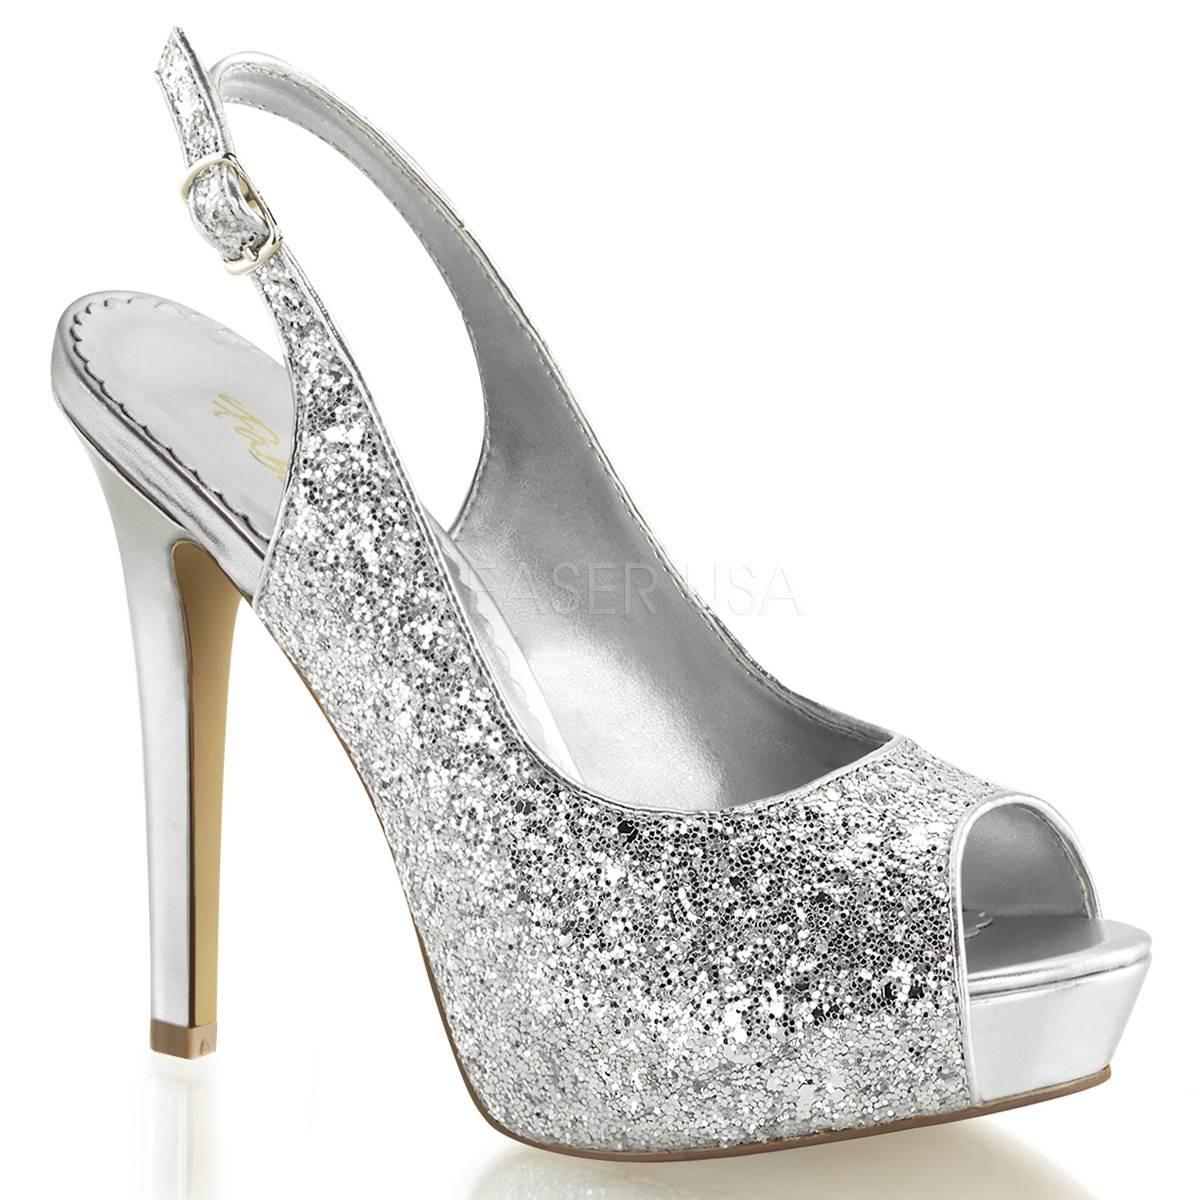 Highheels für Frauen - LUMINA 28G ° Damen Peep Toe Sandalette ° Silber Glitter ° Fabulicious  - Onlineshop RedSixty